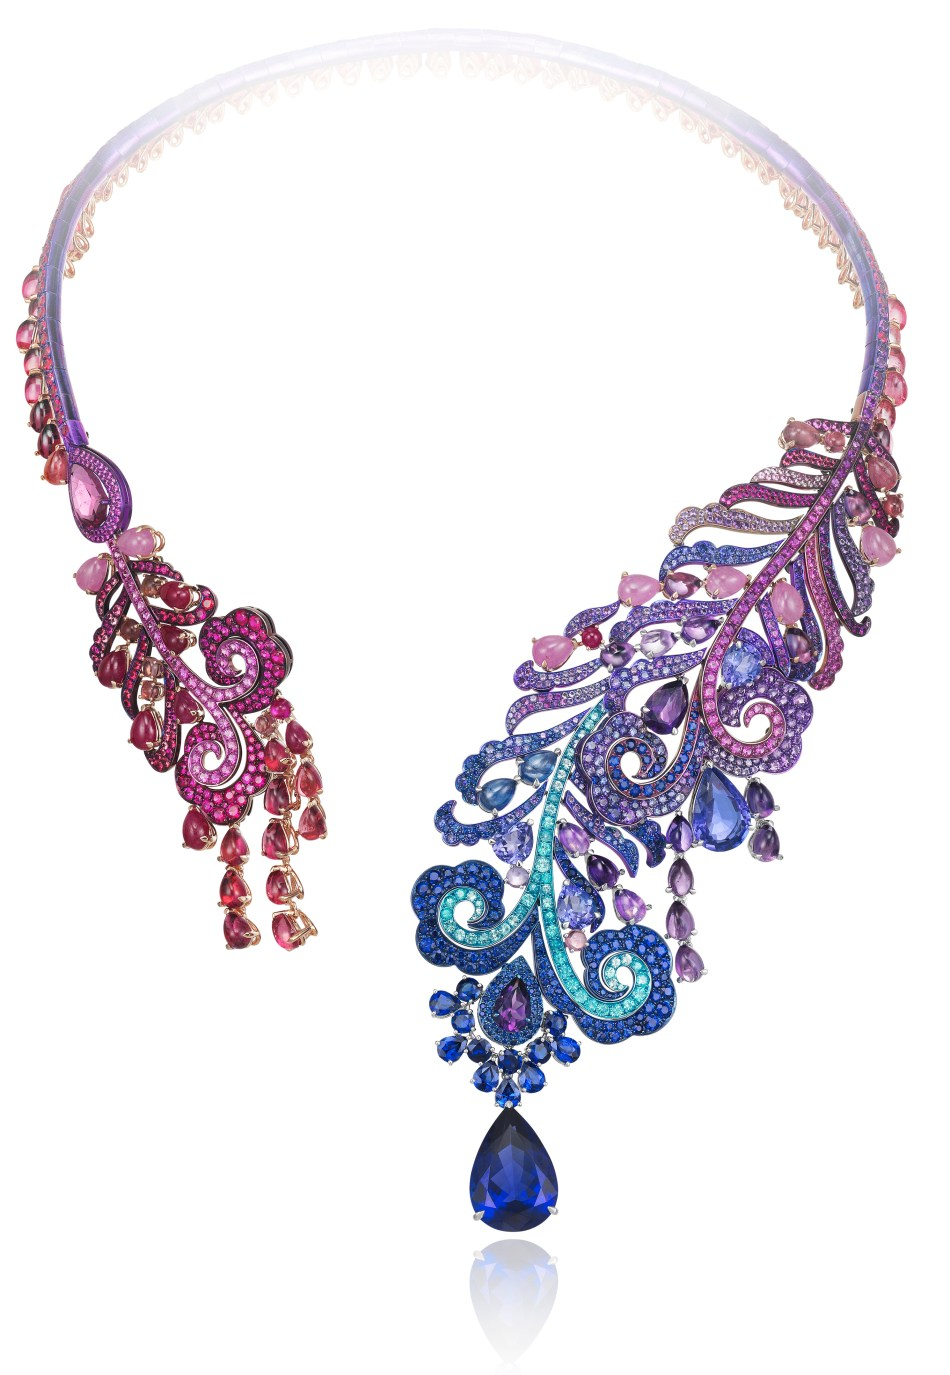 810429-9001 Haute Joaillerie Necklace